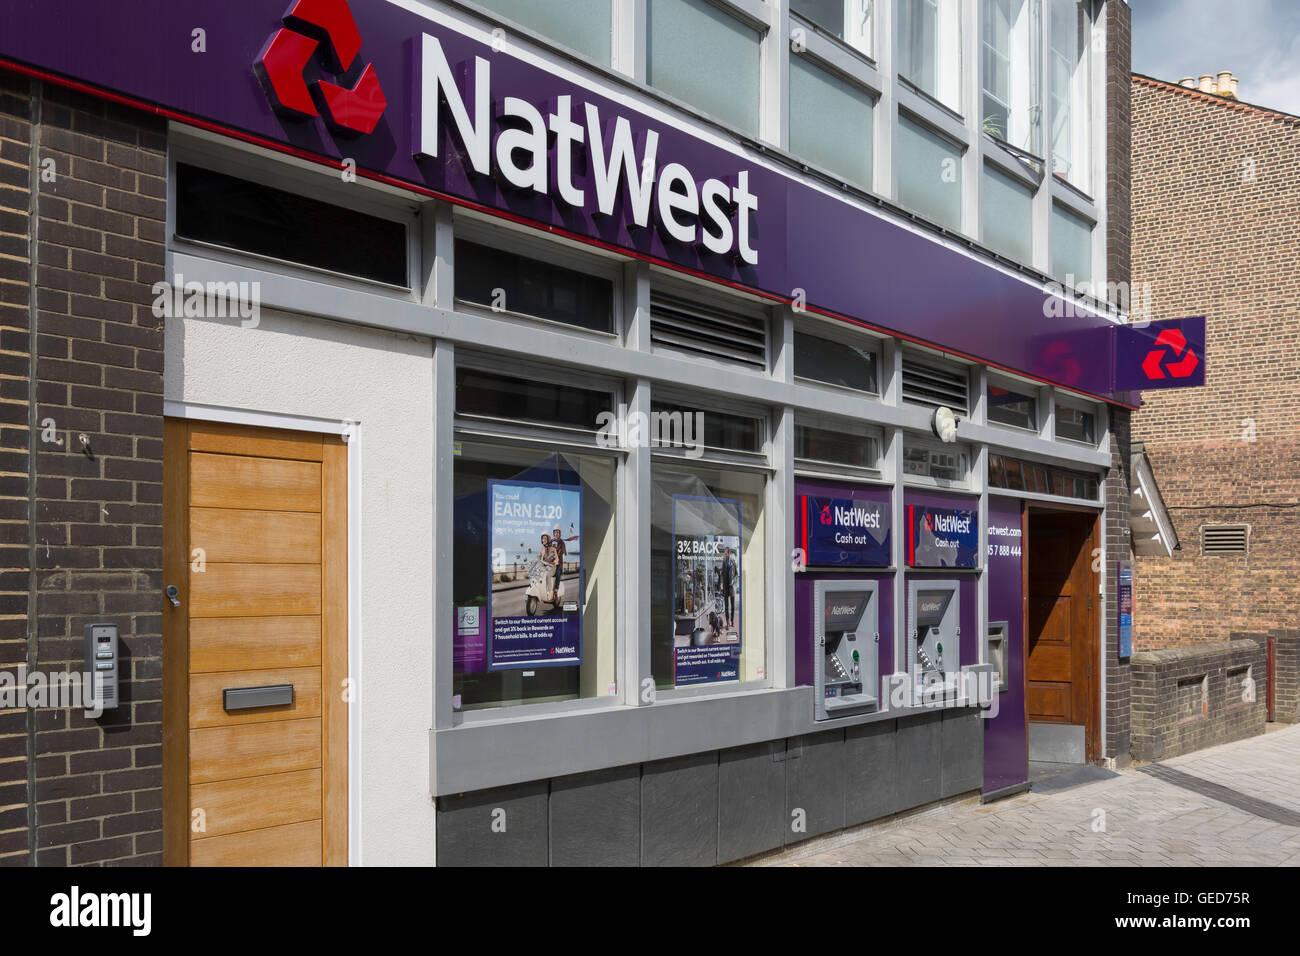 NatWest Bank, Station Road, Redhill, Surrey, England, United Kingdom - Stock Image